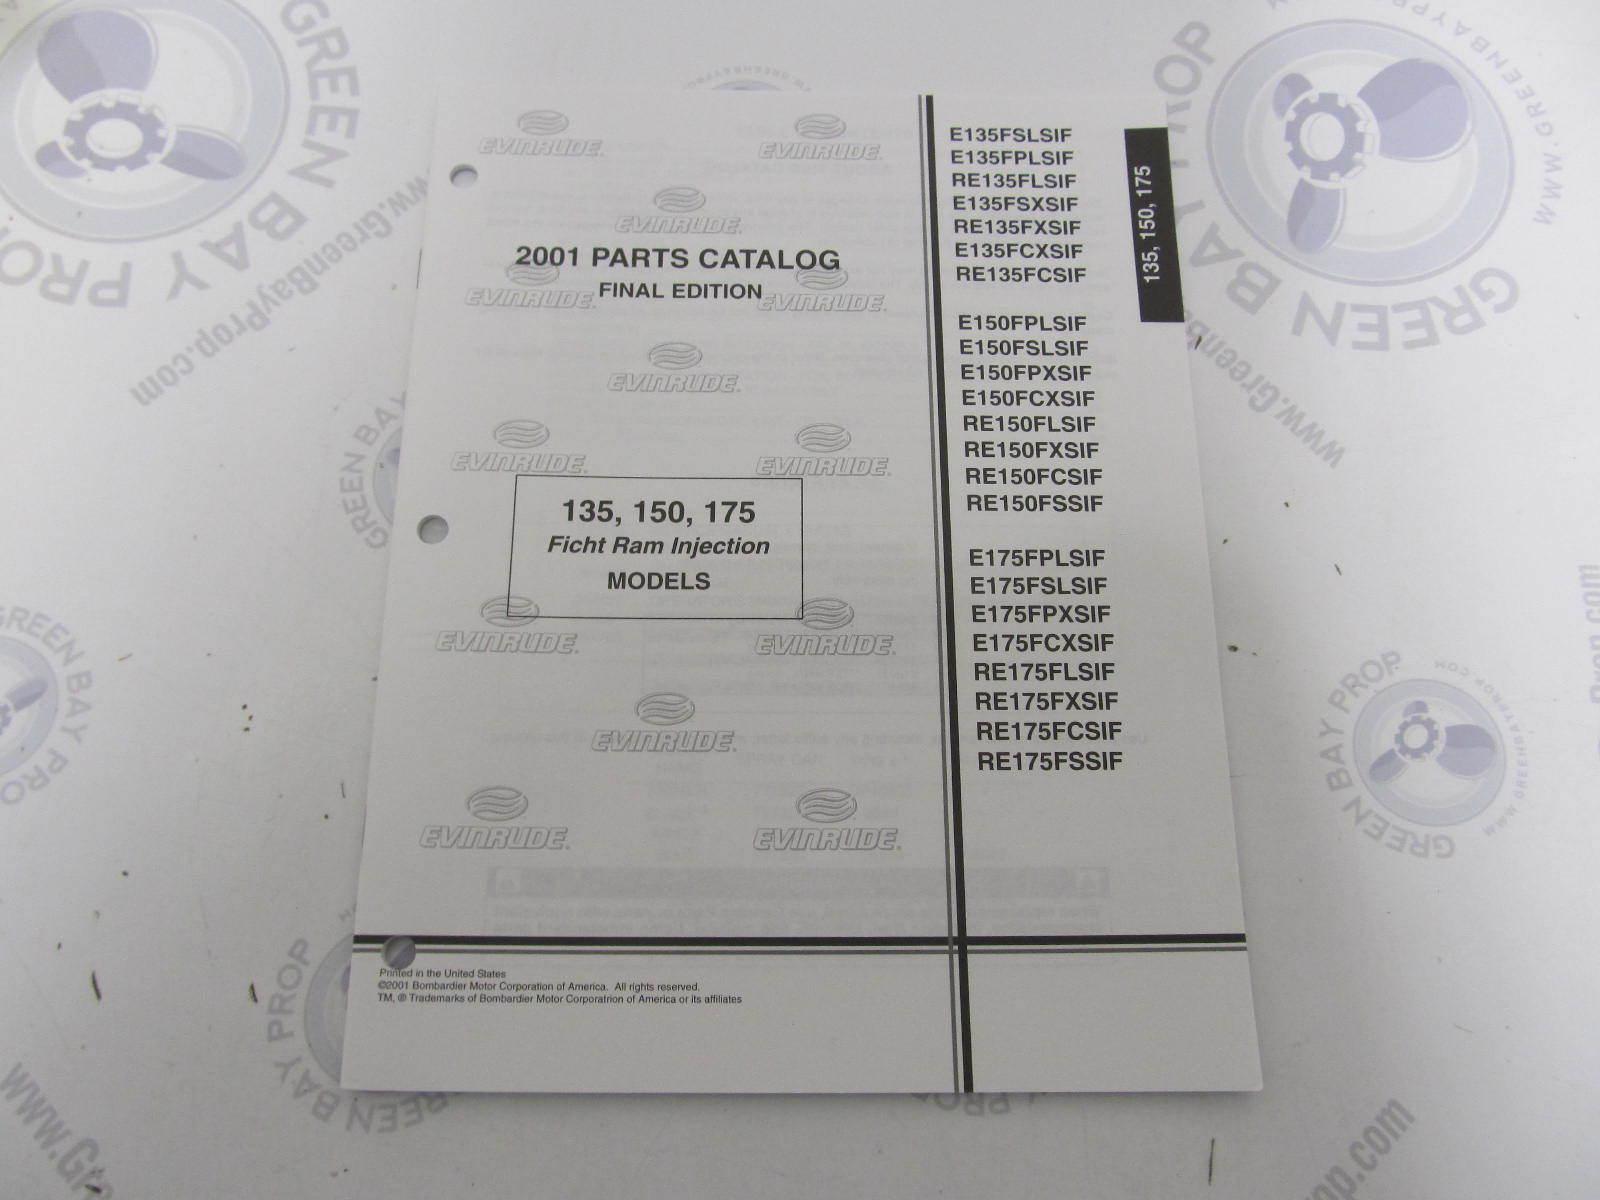 5001688 OMC BRP Evinrude 135/150/175 Ficht Outboard Parts Catalog 2001